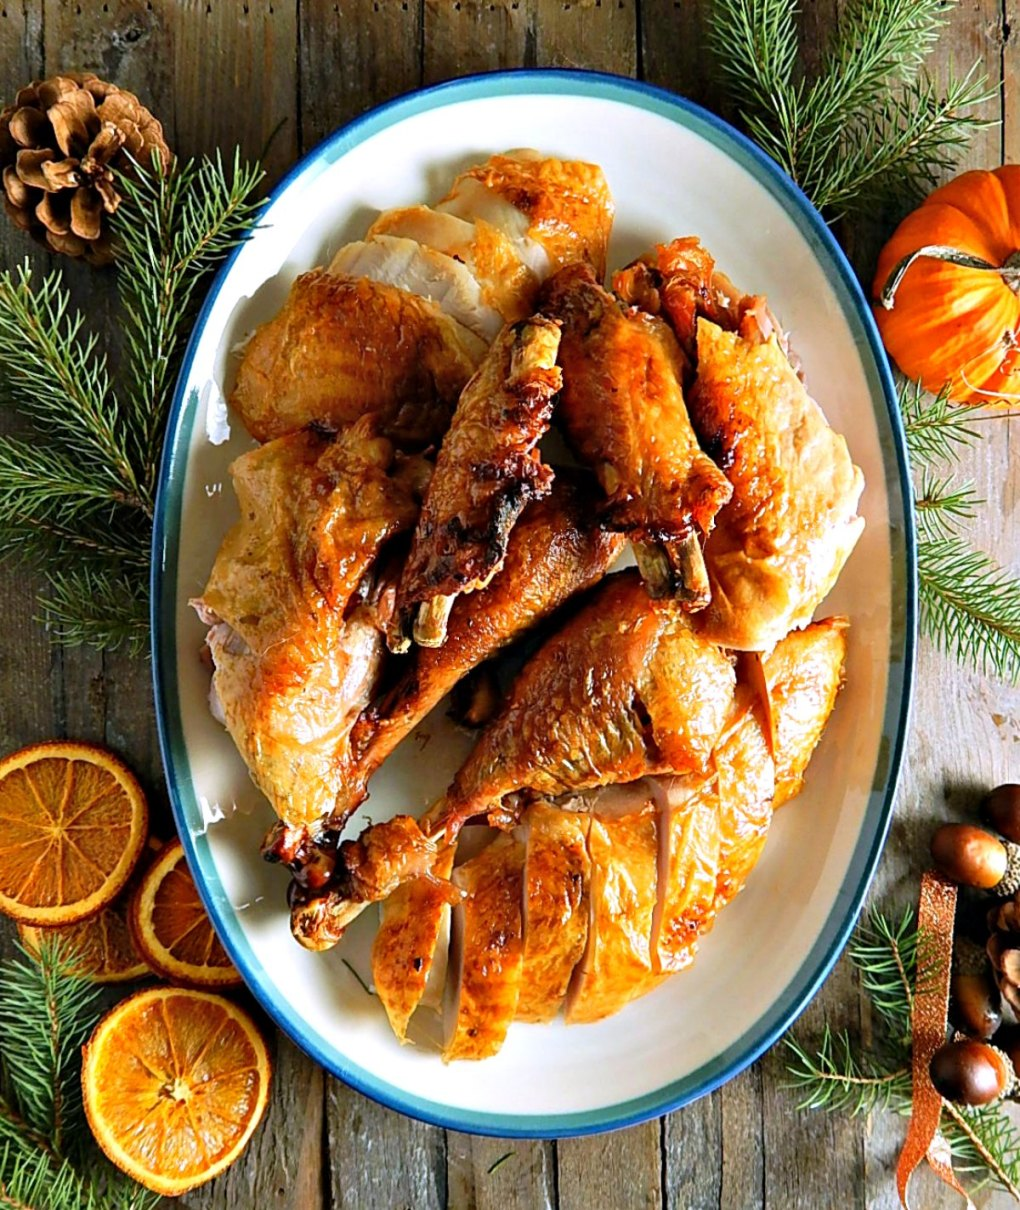 Almost Bon Appetit's Dry Rubbed Turkey